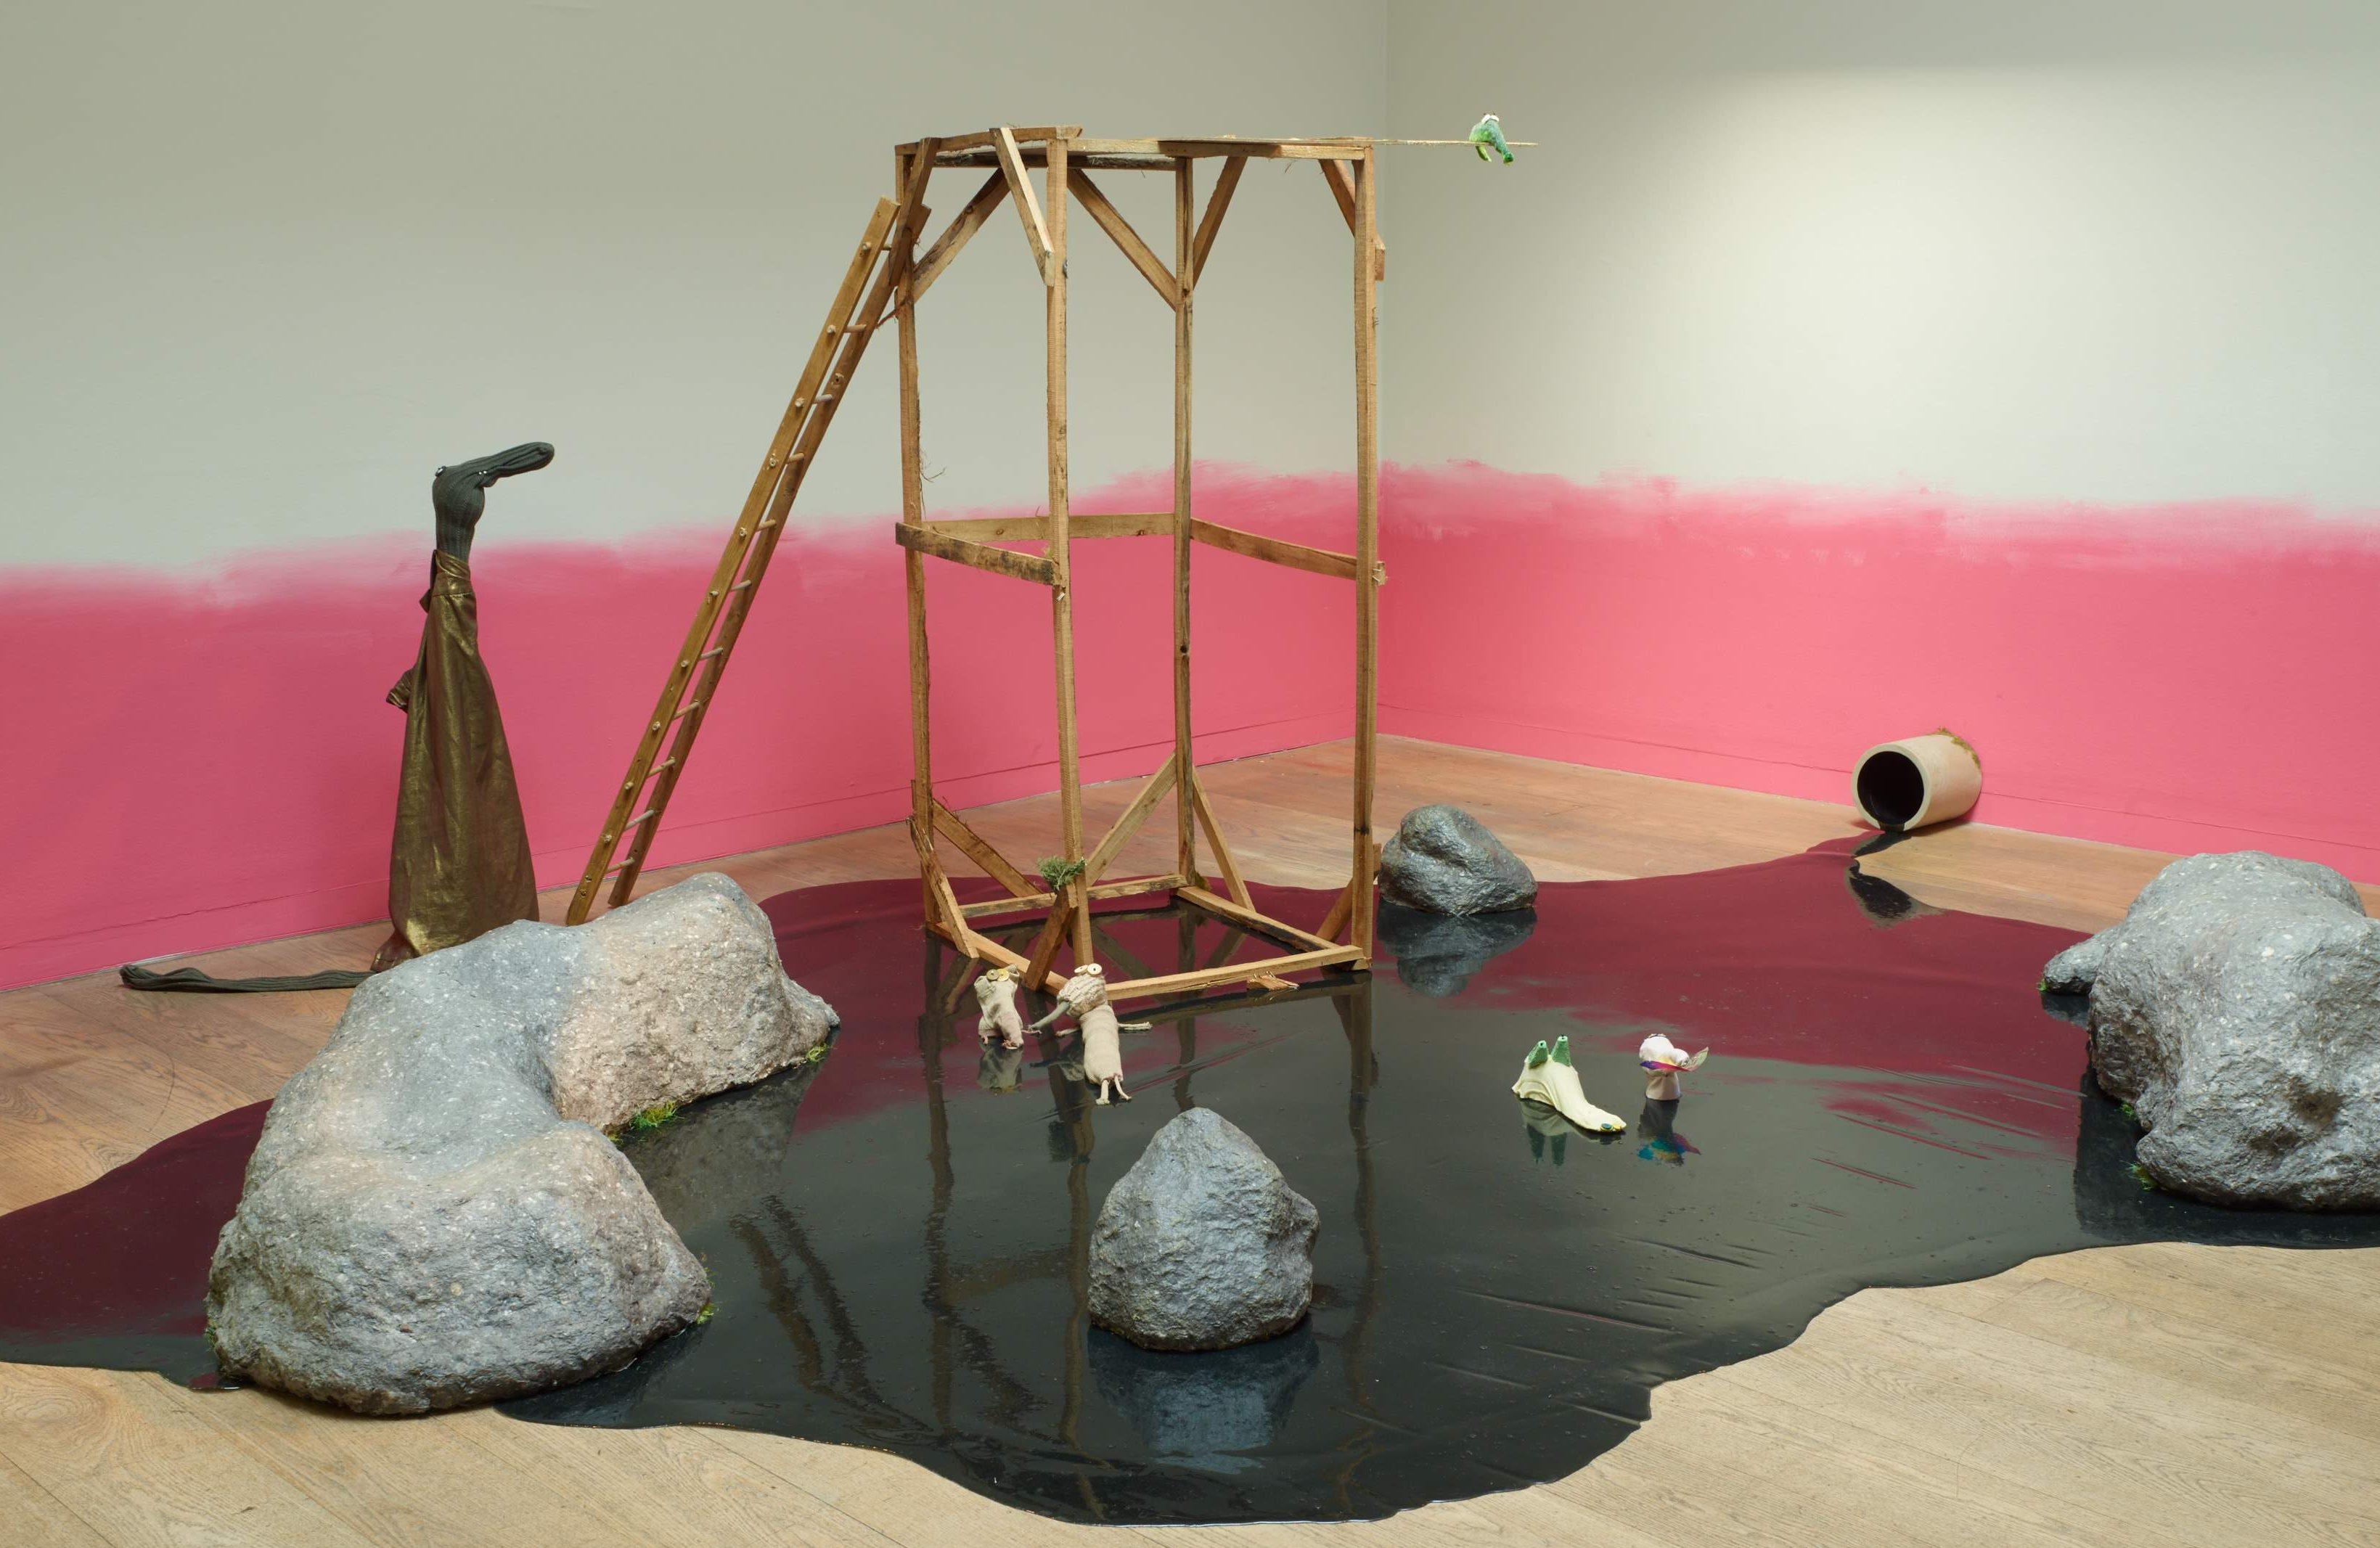 Whitechapel Gallery Children's Commission 2016 - Edwina Ashton: In the Winter Hours, installation view. Photo: Stephen White